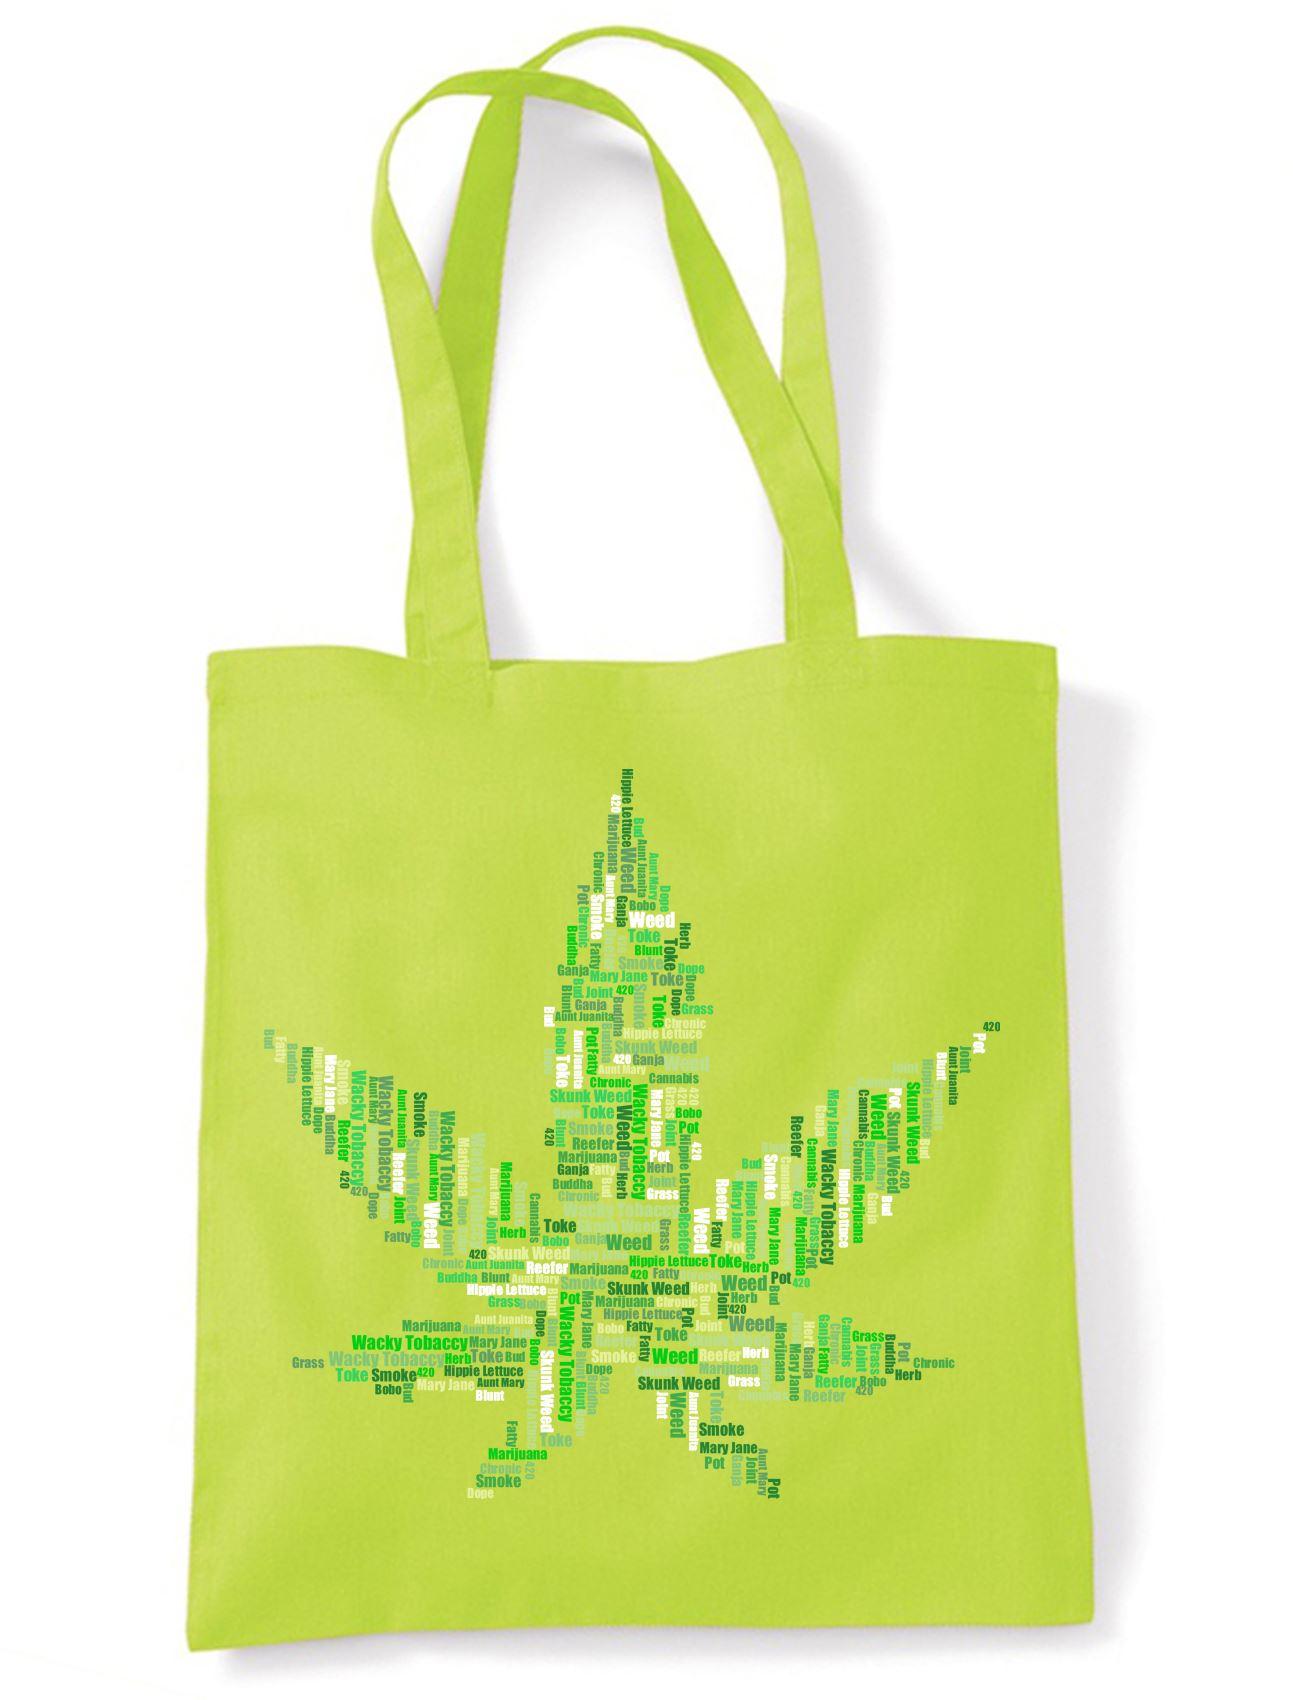 Details about Cannabis Slang Names Funny Tote Shoulder Shopping Bag